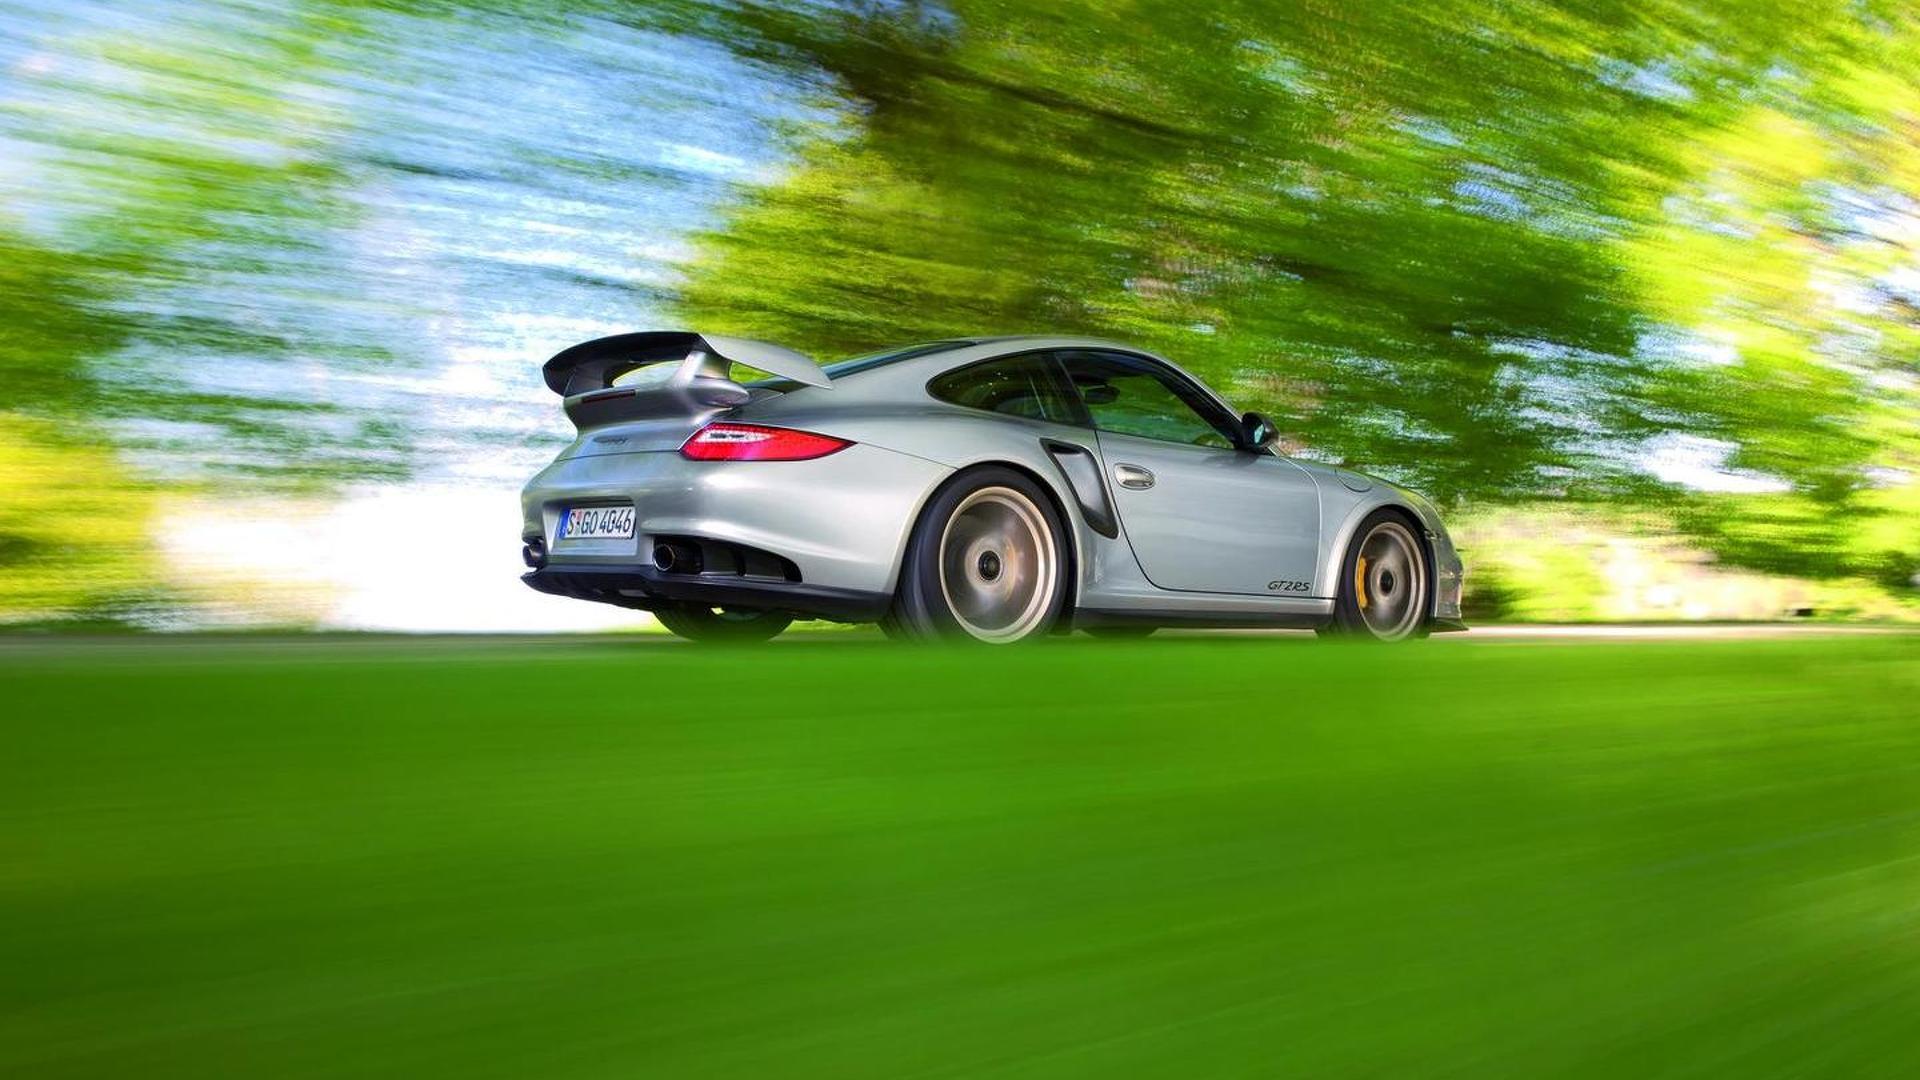 2011-227114-2011-porsche-911-gt2-rs-11-03-20111 Stunning Porsche 911 Gt2 Rs Vs Lamborghini Aventador Cars Trend